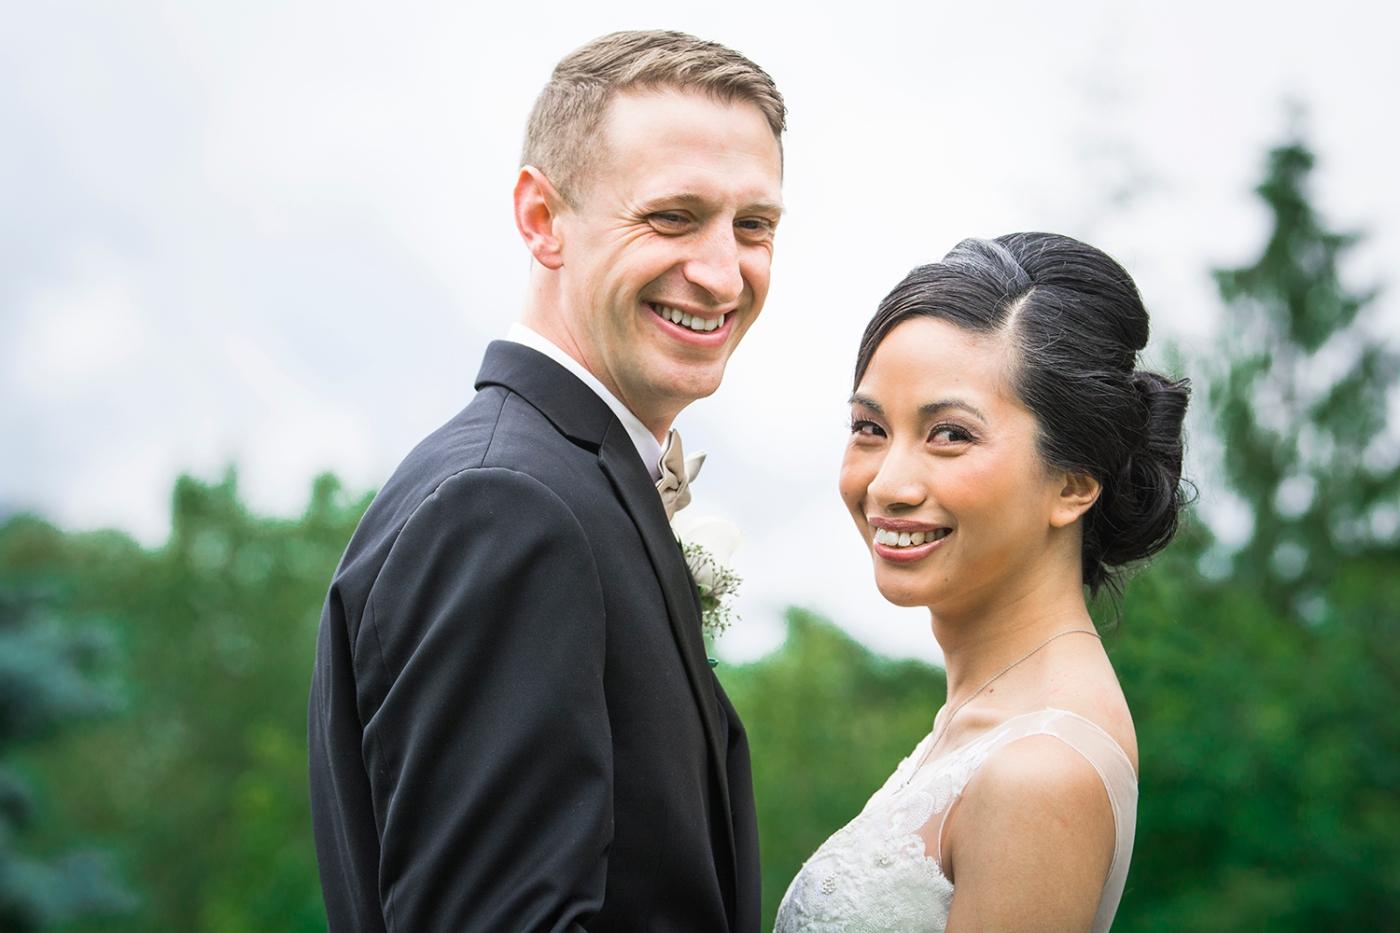 Jane_Speleers_2016_arriving to reception _Wedding_Wild_Rose_Estates_VenueJS7_7625